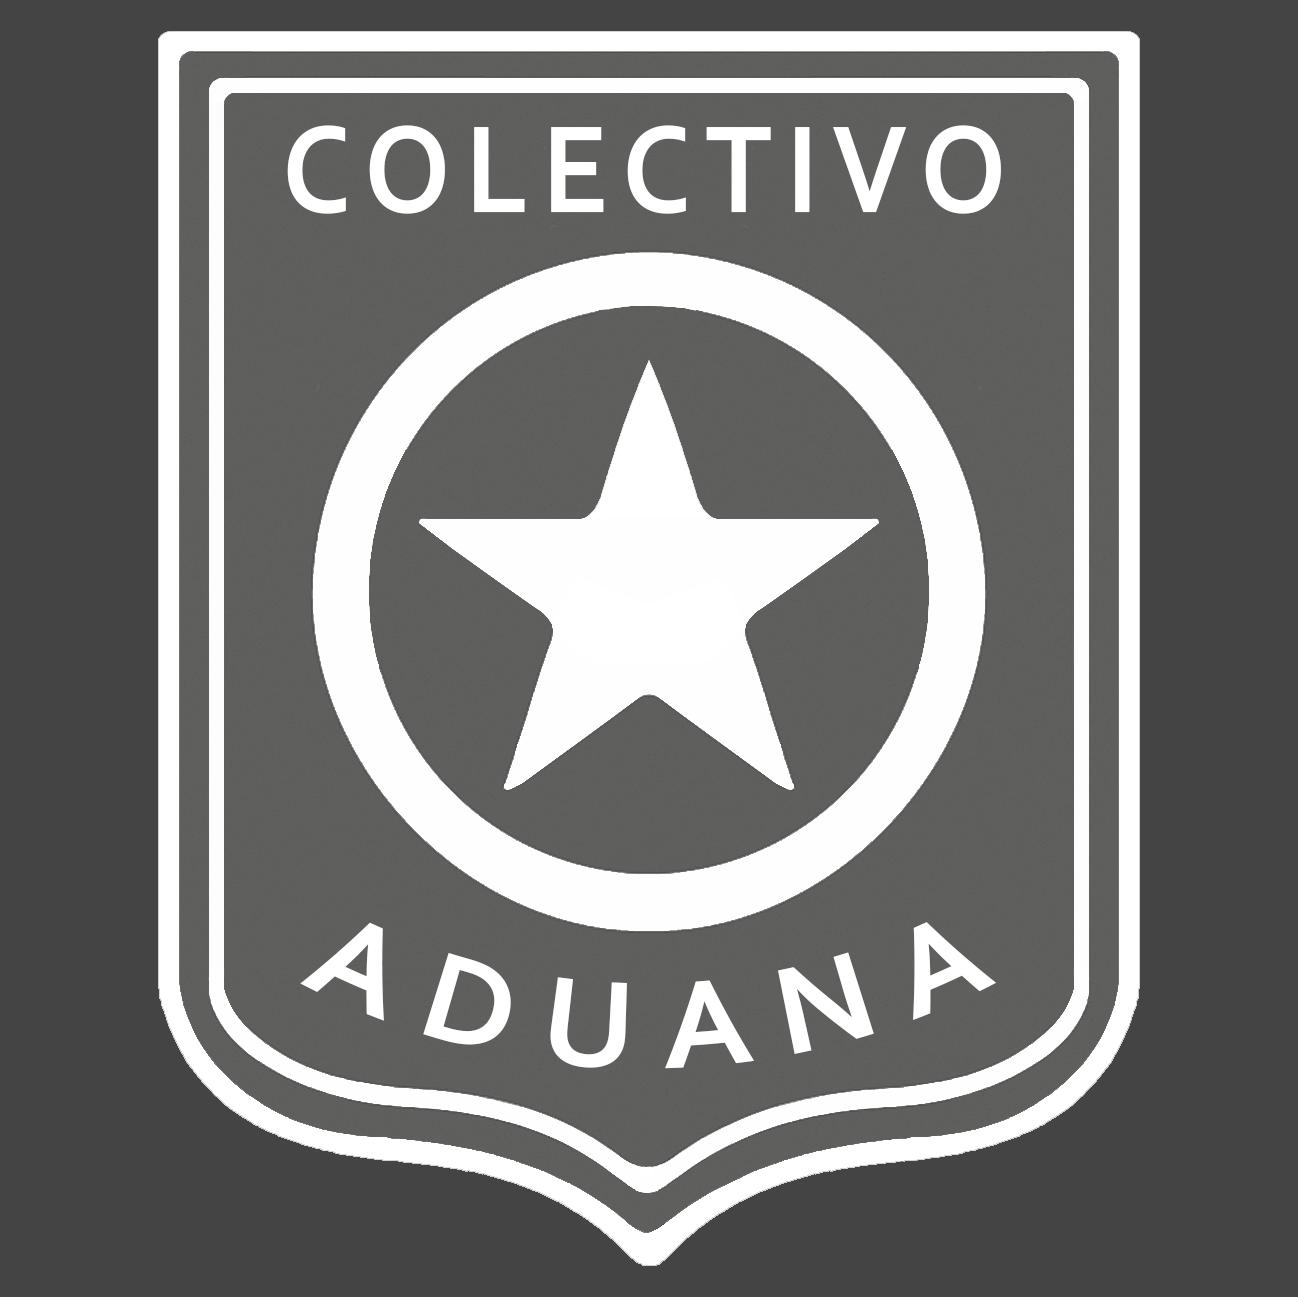 Colectivo Aduana